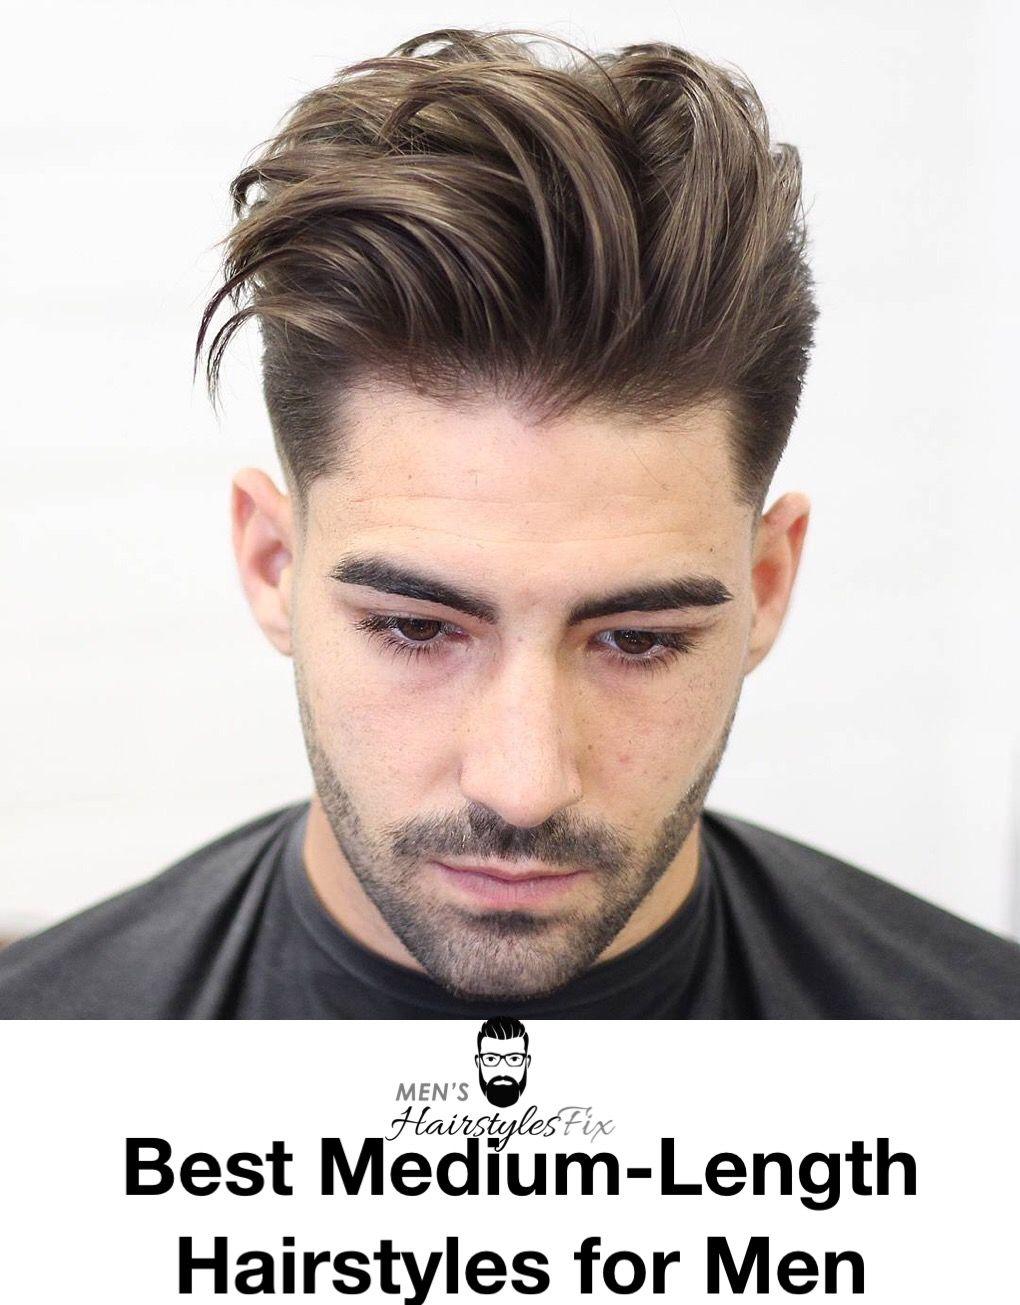 Mens haircut styles medium length  best mediumlength hairstyles for men in   mediumlength